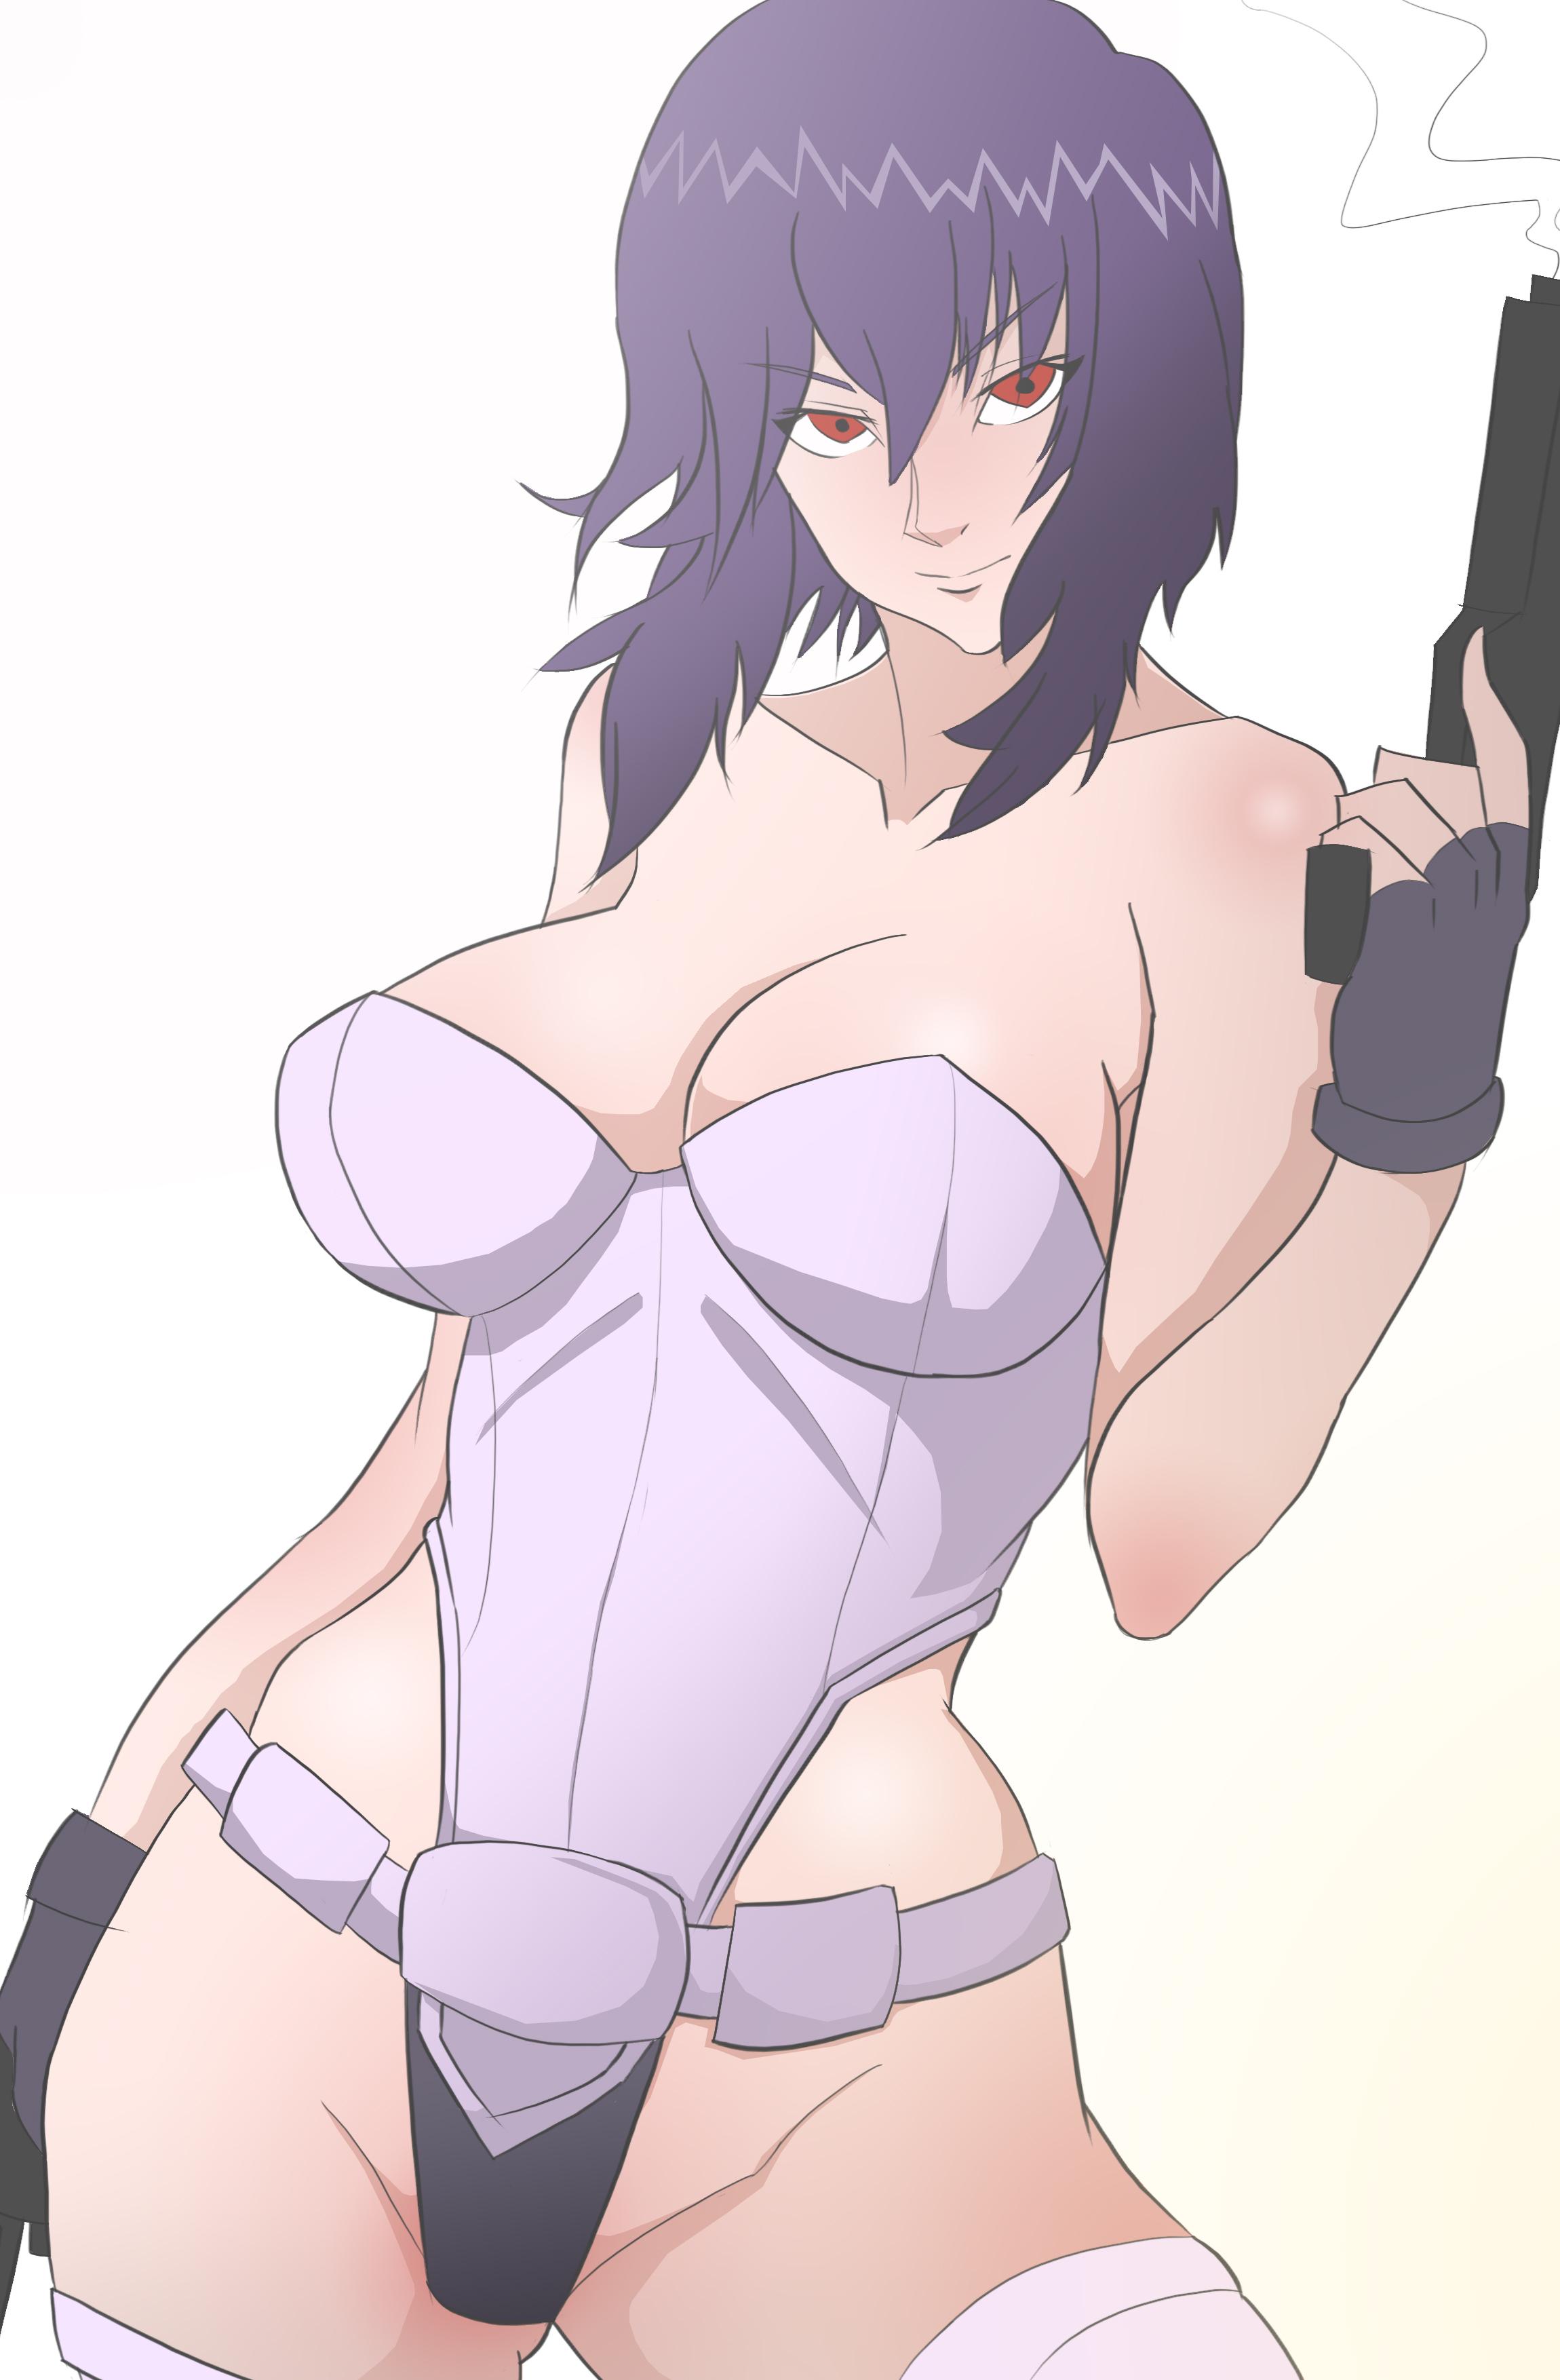 Major Motoko kusanagi